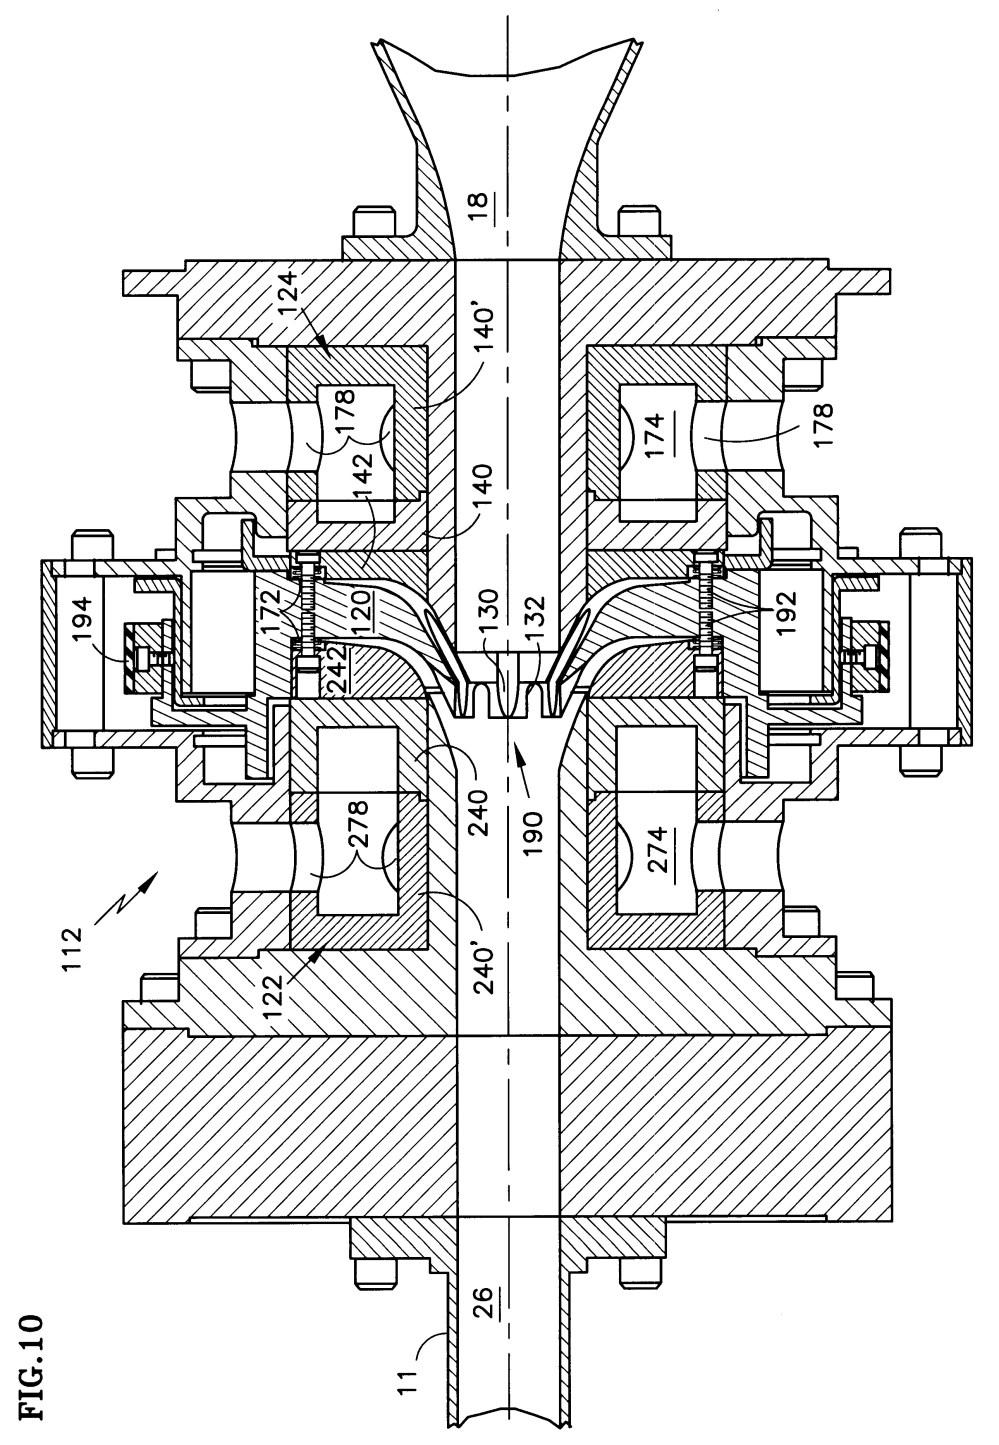 medium resolution of bodine b100 fluorescent emergency ballast wiring diagram wiringbodine emergency ballast wiring diagram b100 fluorescent